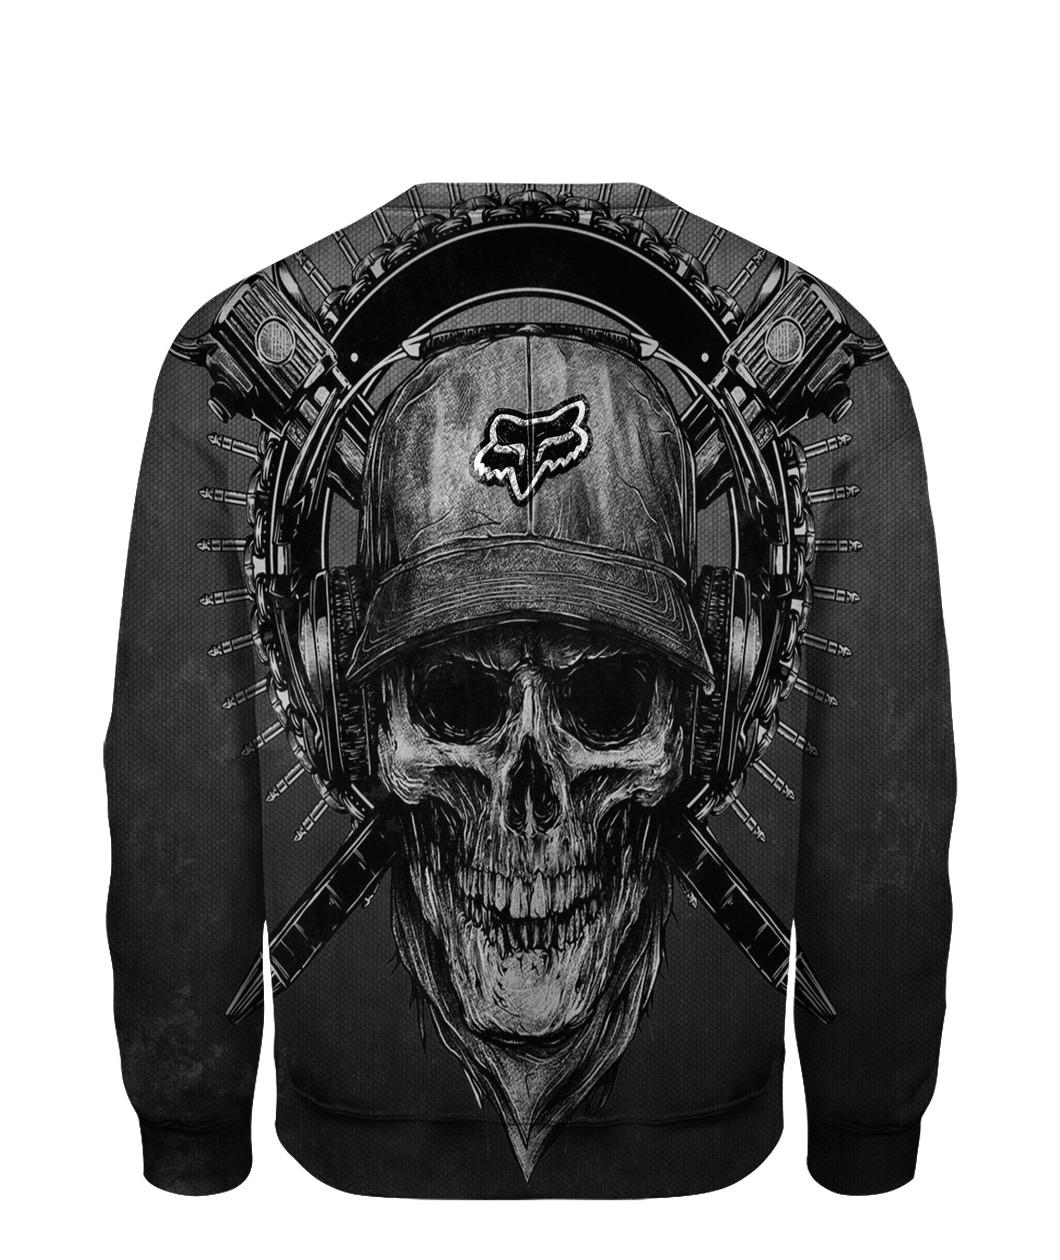 Terror noise division fox racing all over print sweatshirt - back